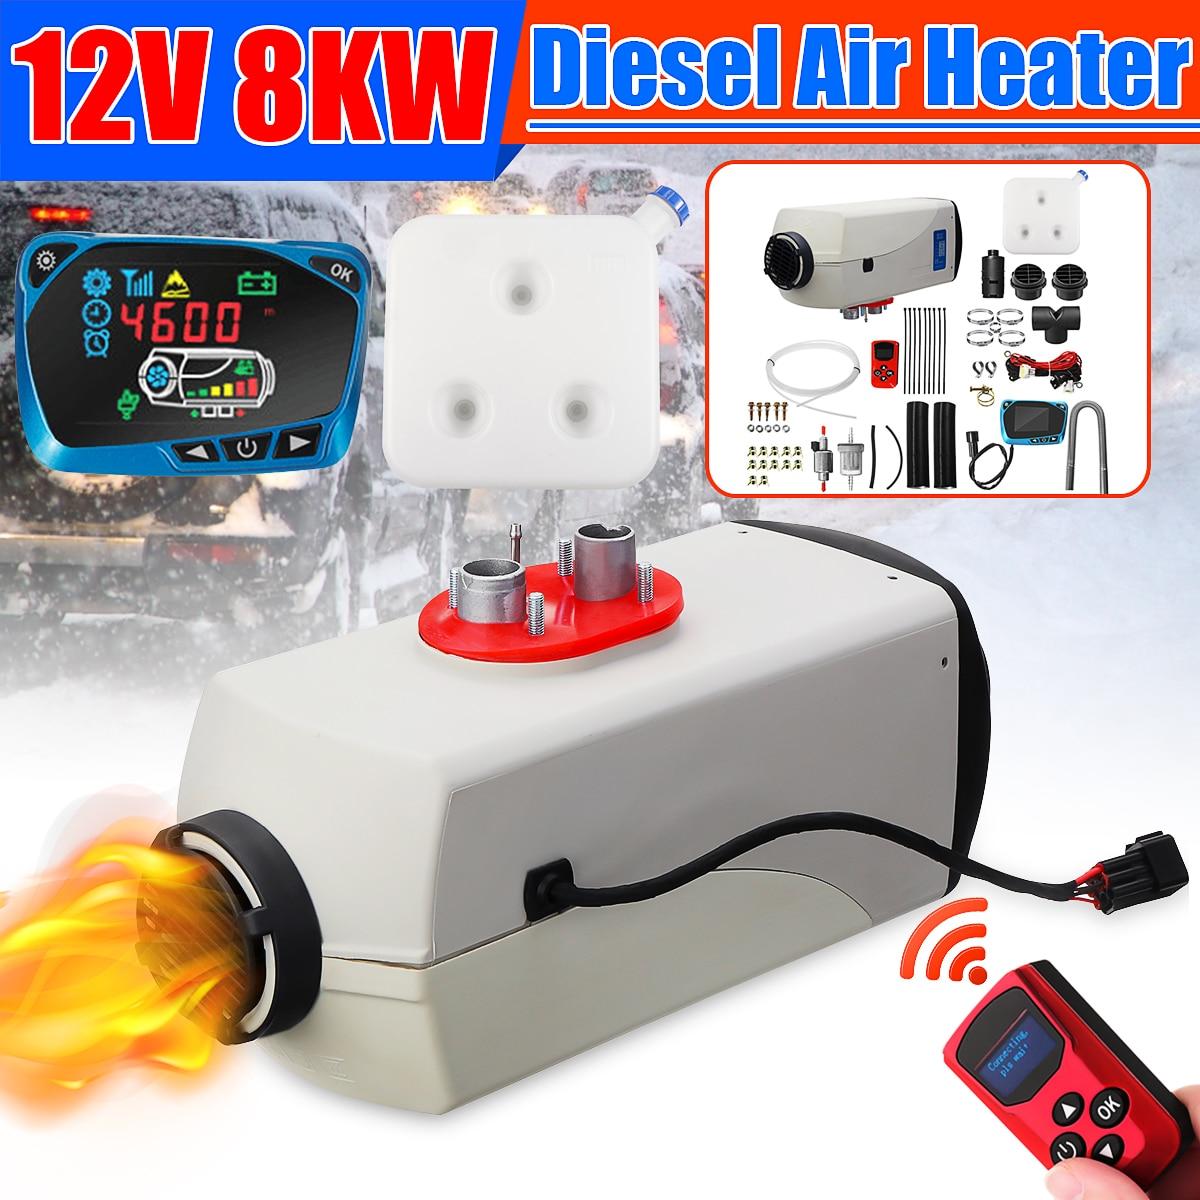 8000W Air diesels chauffage 8KW 12V voiture chauffage pour camions camping-cars bateaux Bus + LCD moniteur commutateur (russie effacer linventaire)